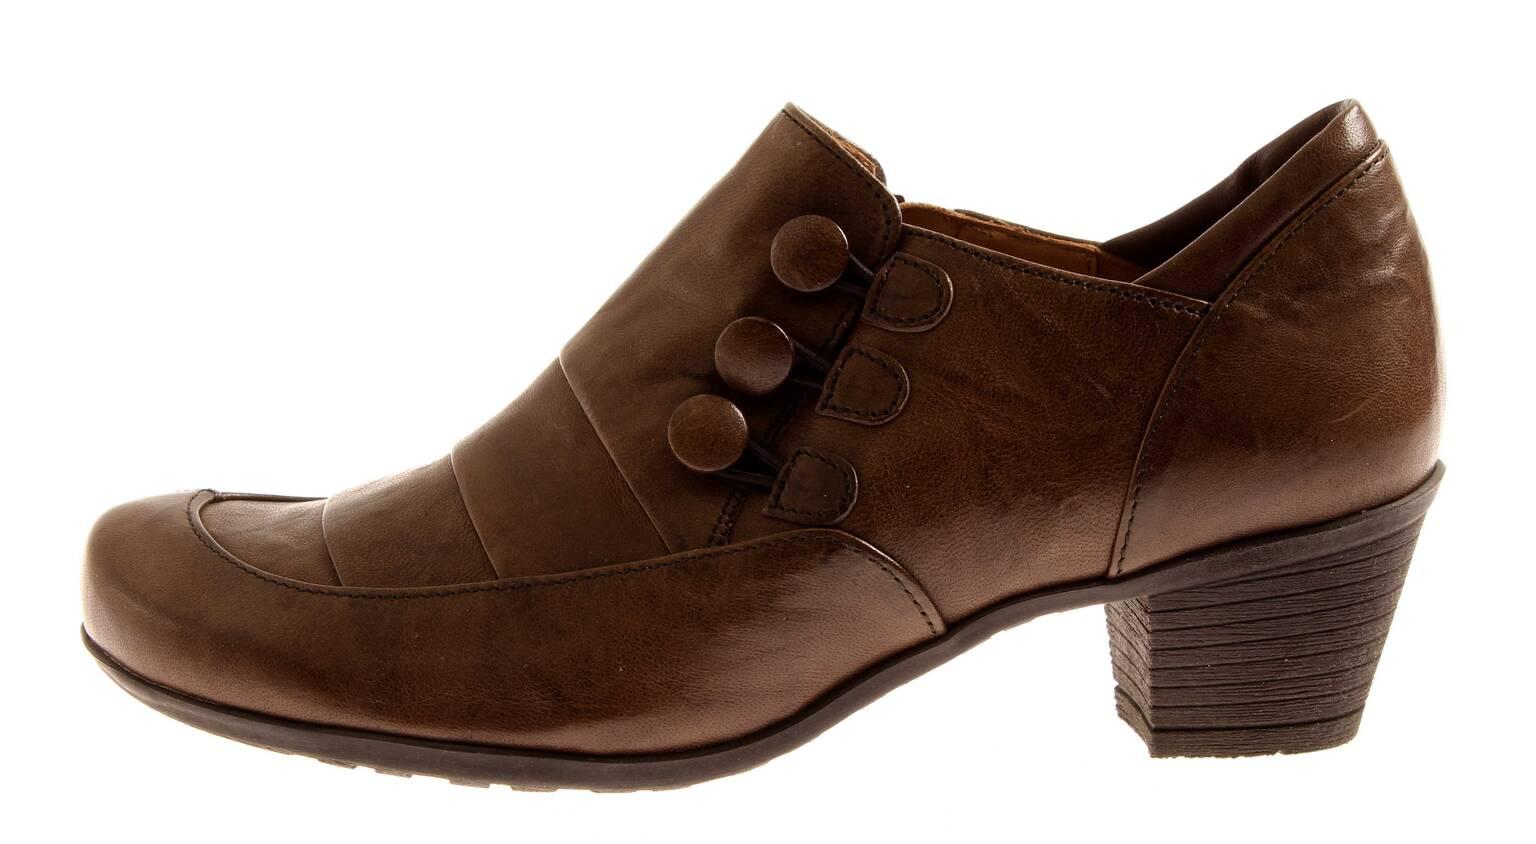 Gabor Hochfrontpumps Leder Damenschuhe Schuhe Leder Hochfrontpumps Ankle Stiefel 74.492 daca38